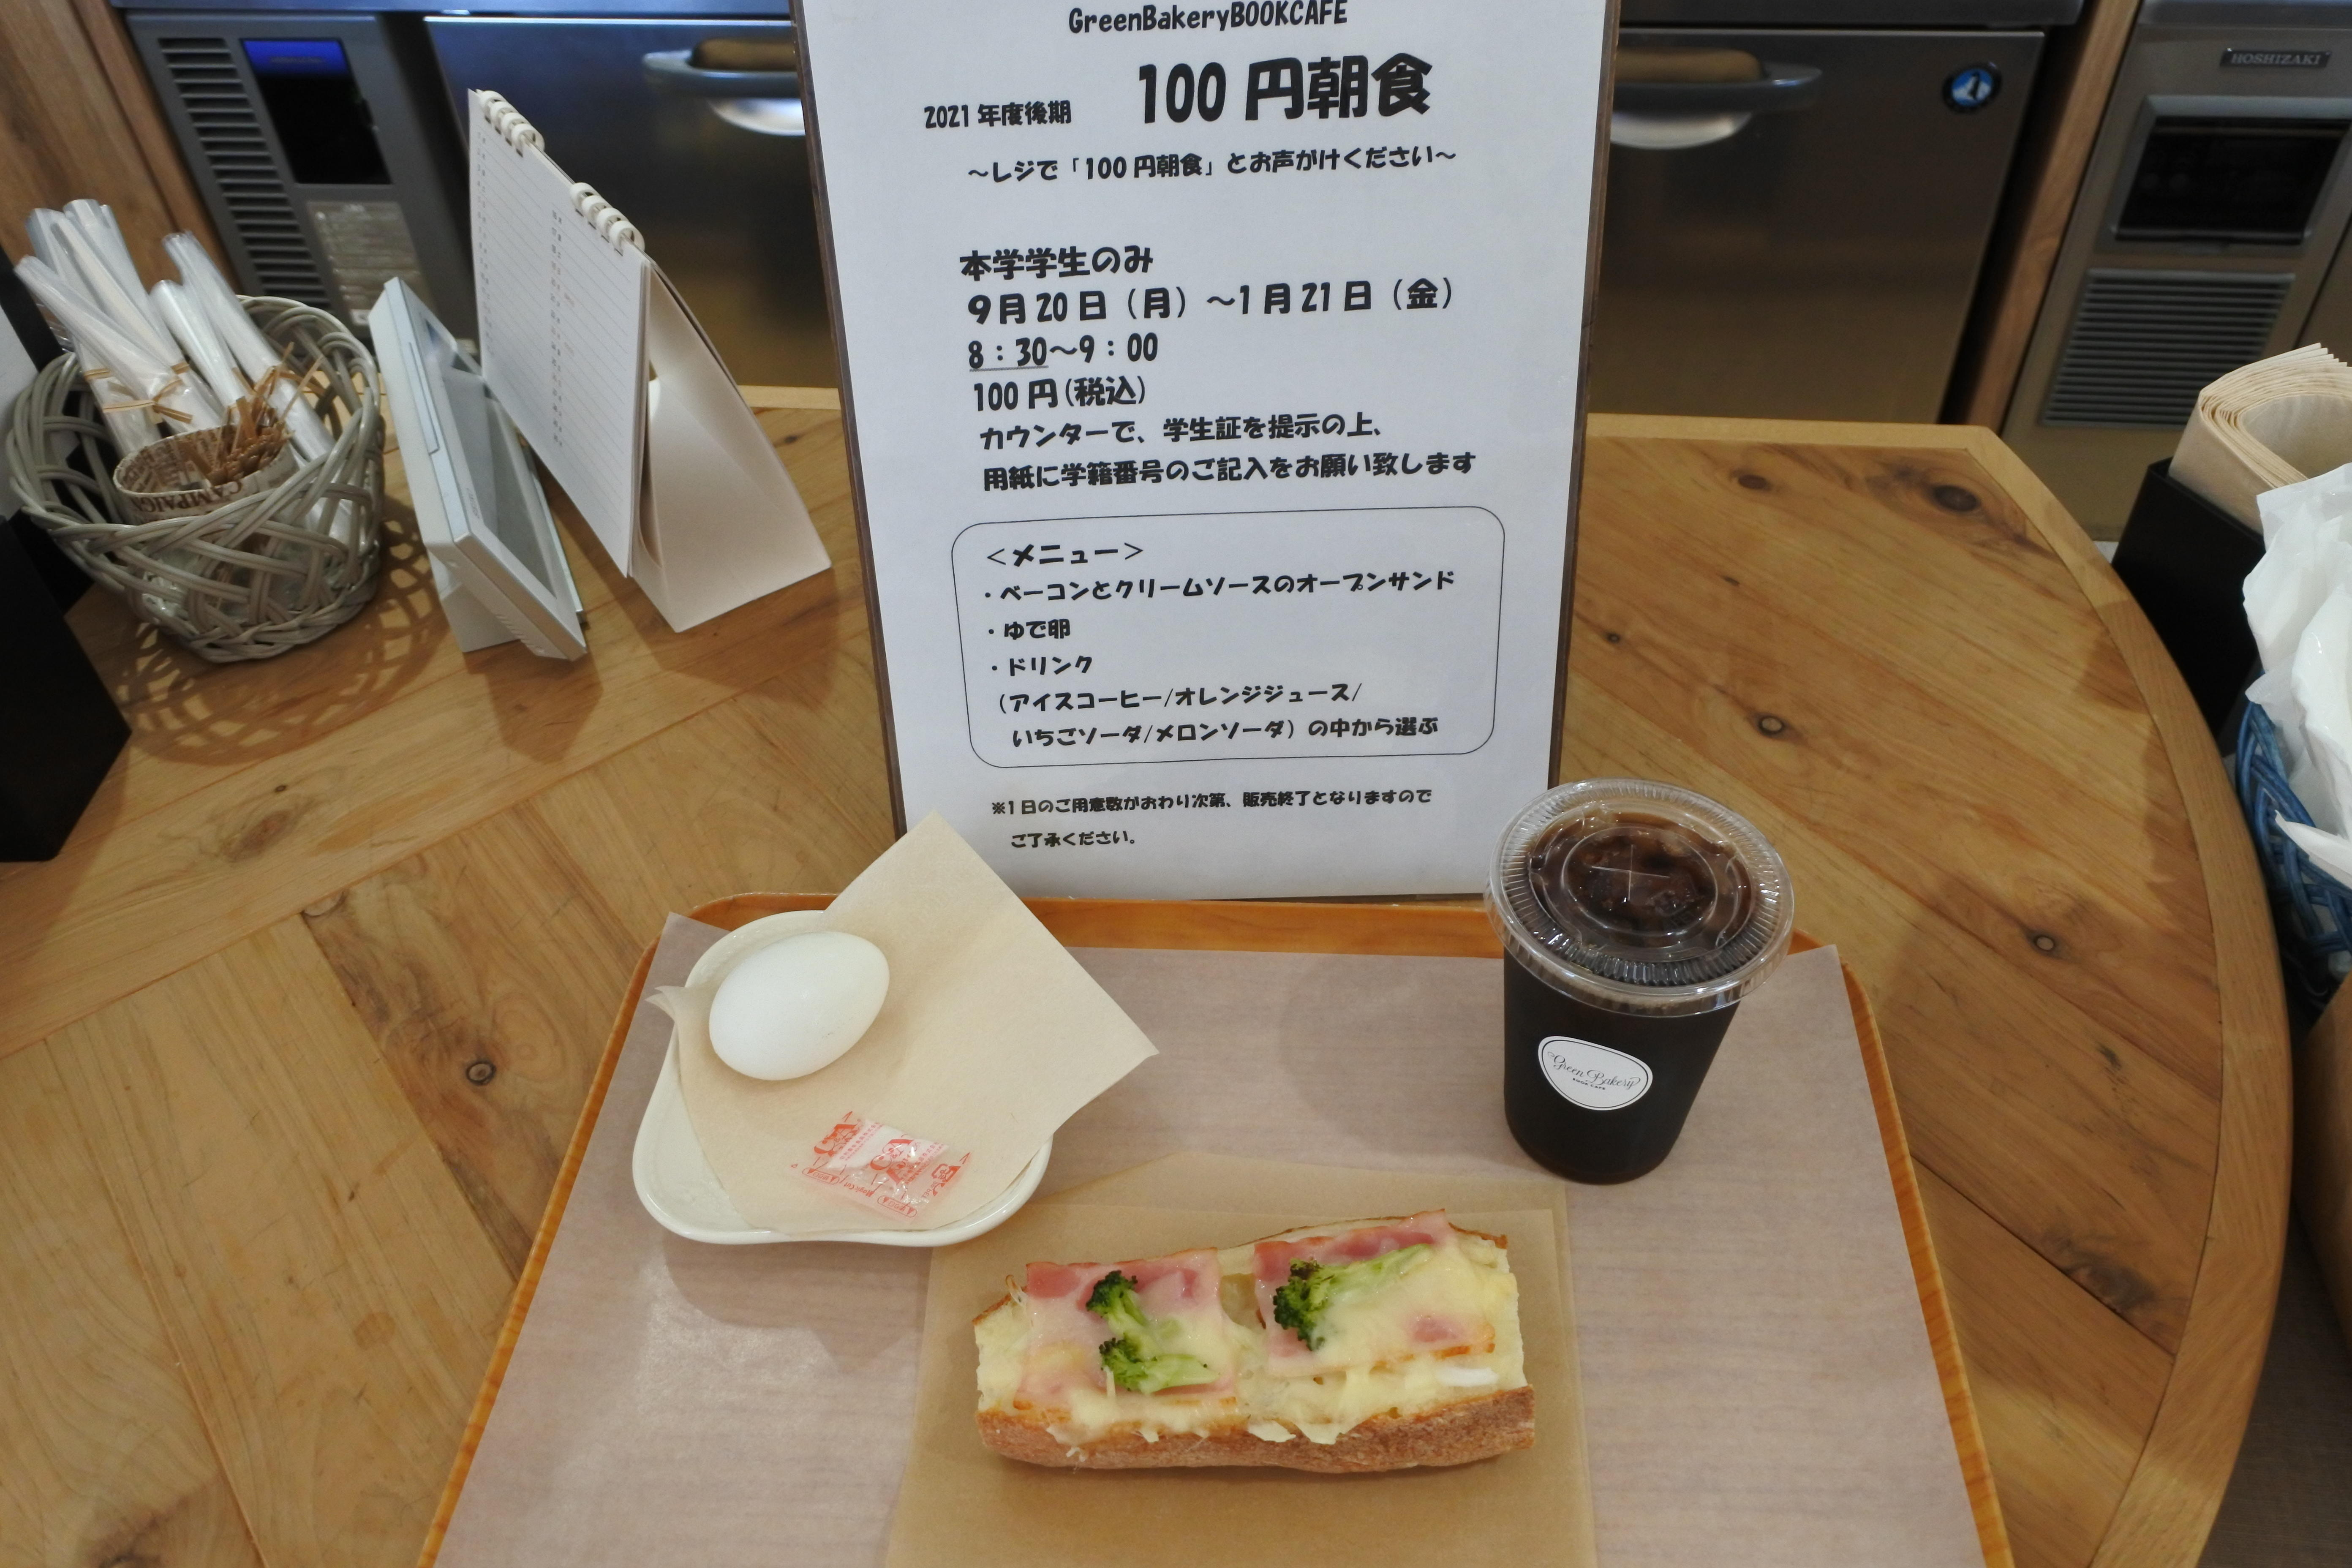 Green Bakery BOOK CAFEの新メニュー